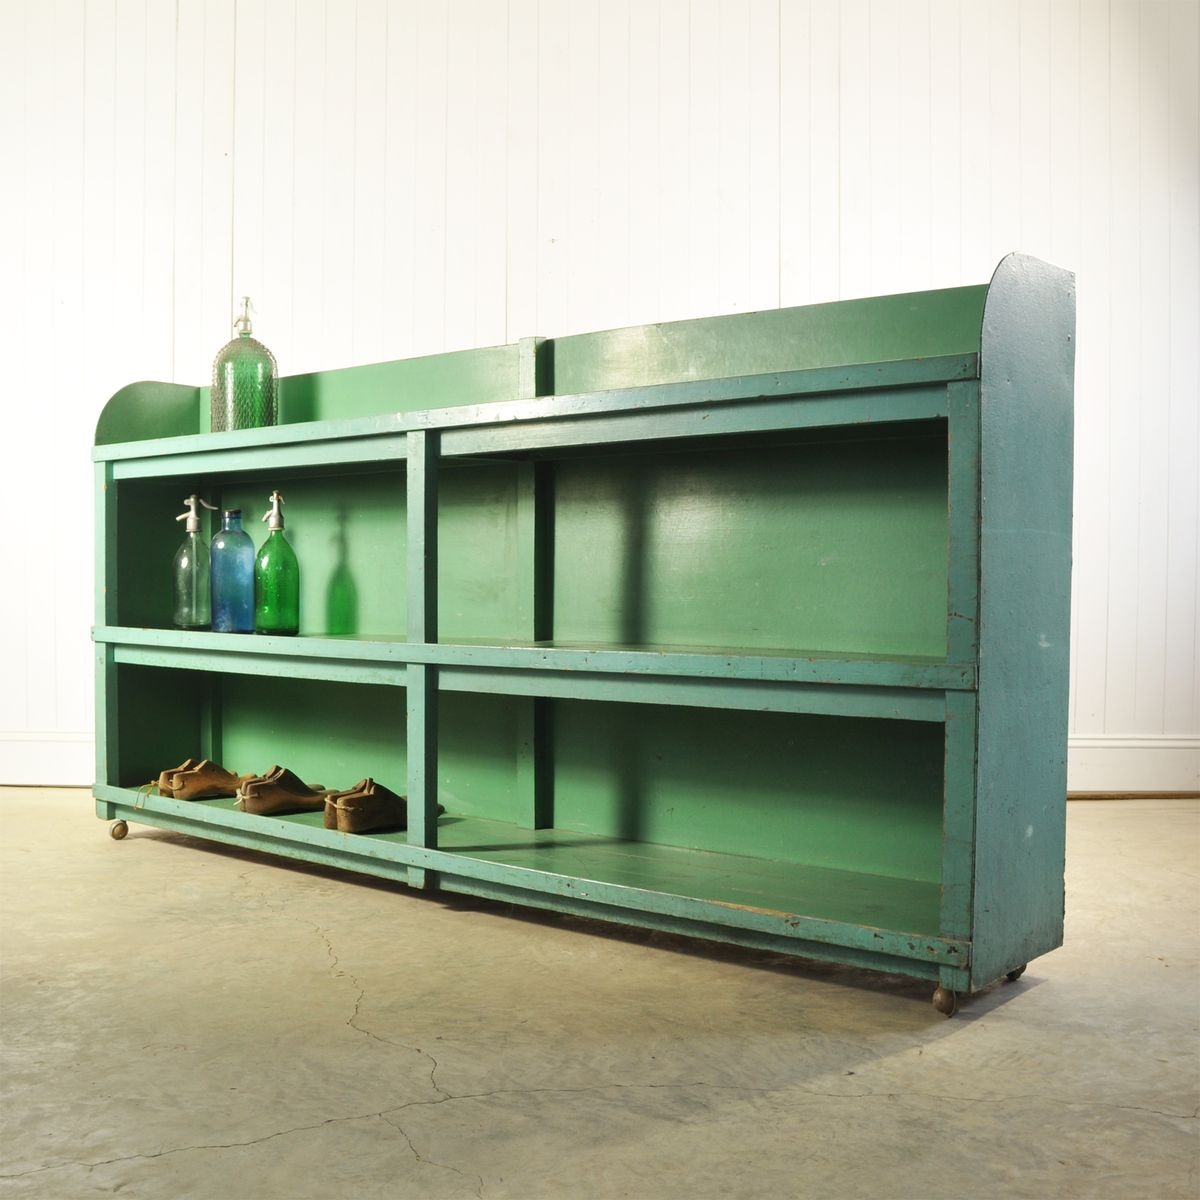 gr nes industrielles vintage regal bei pamono kaufen. Black Bedroom Furniture Sets. Home Design Ideas